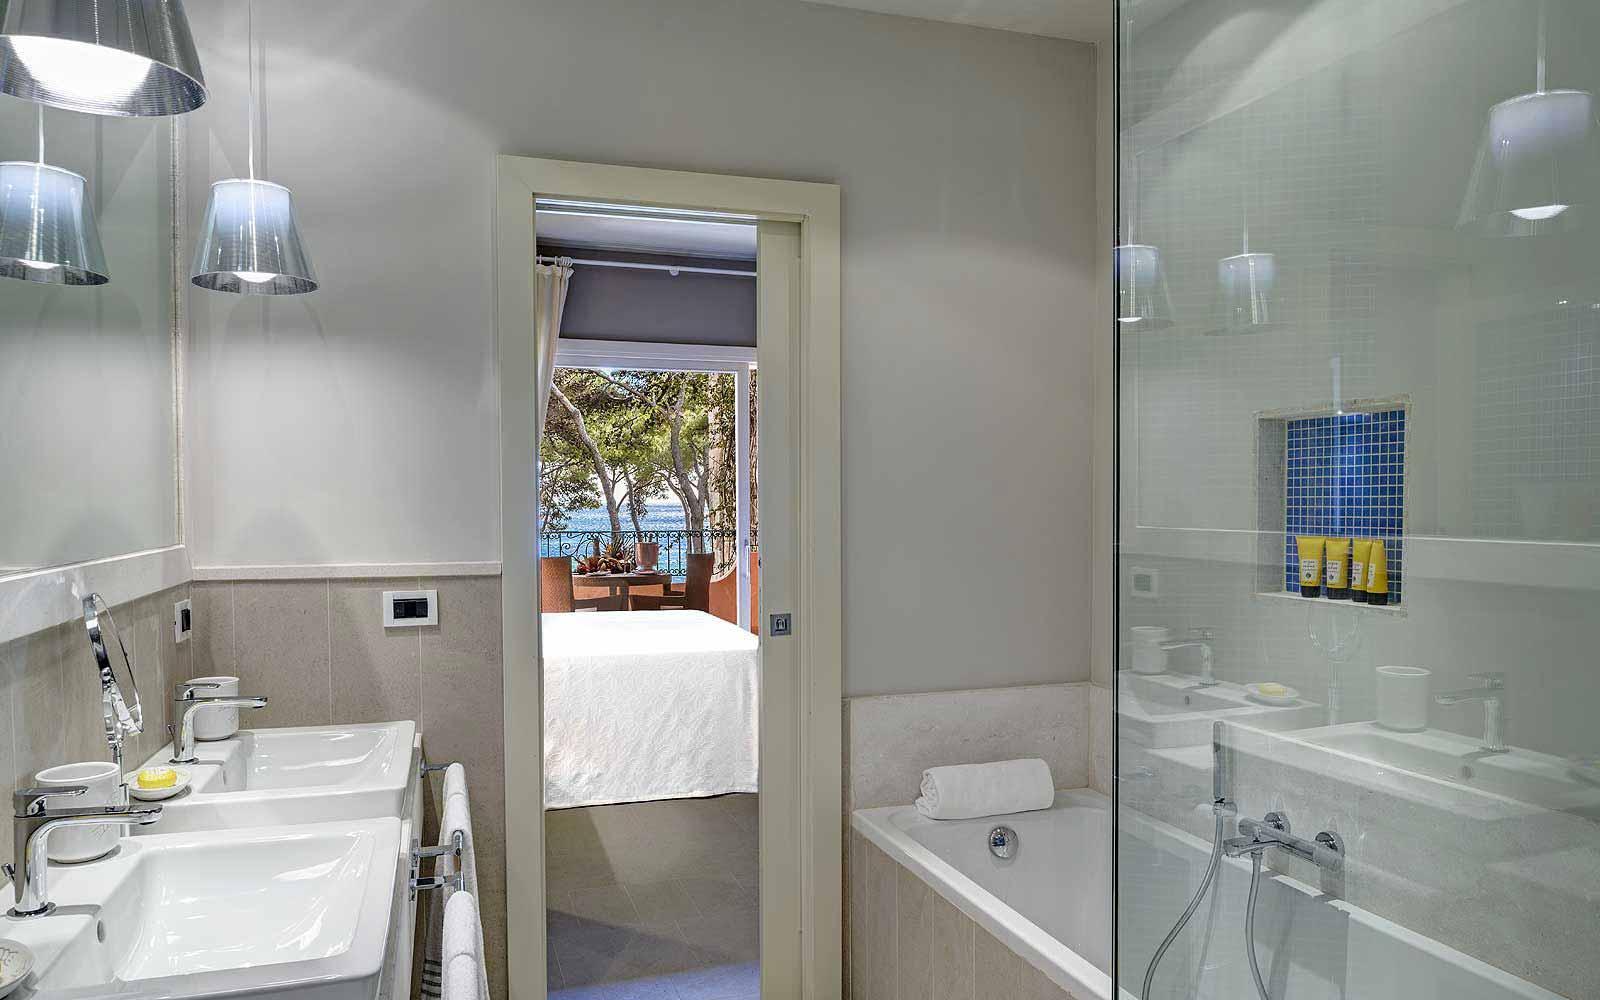 Executive Mare bathroom at Forte Village Hotel Castello